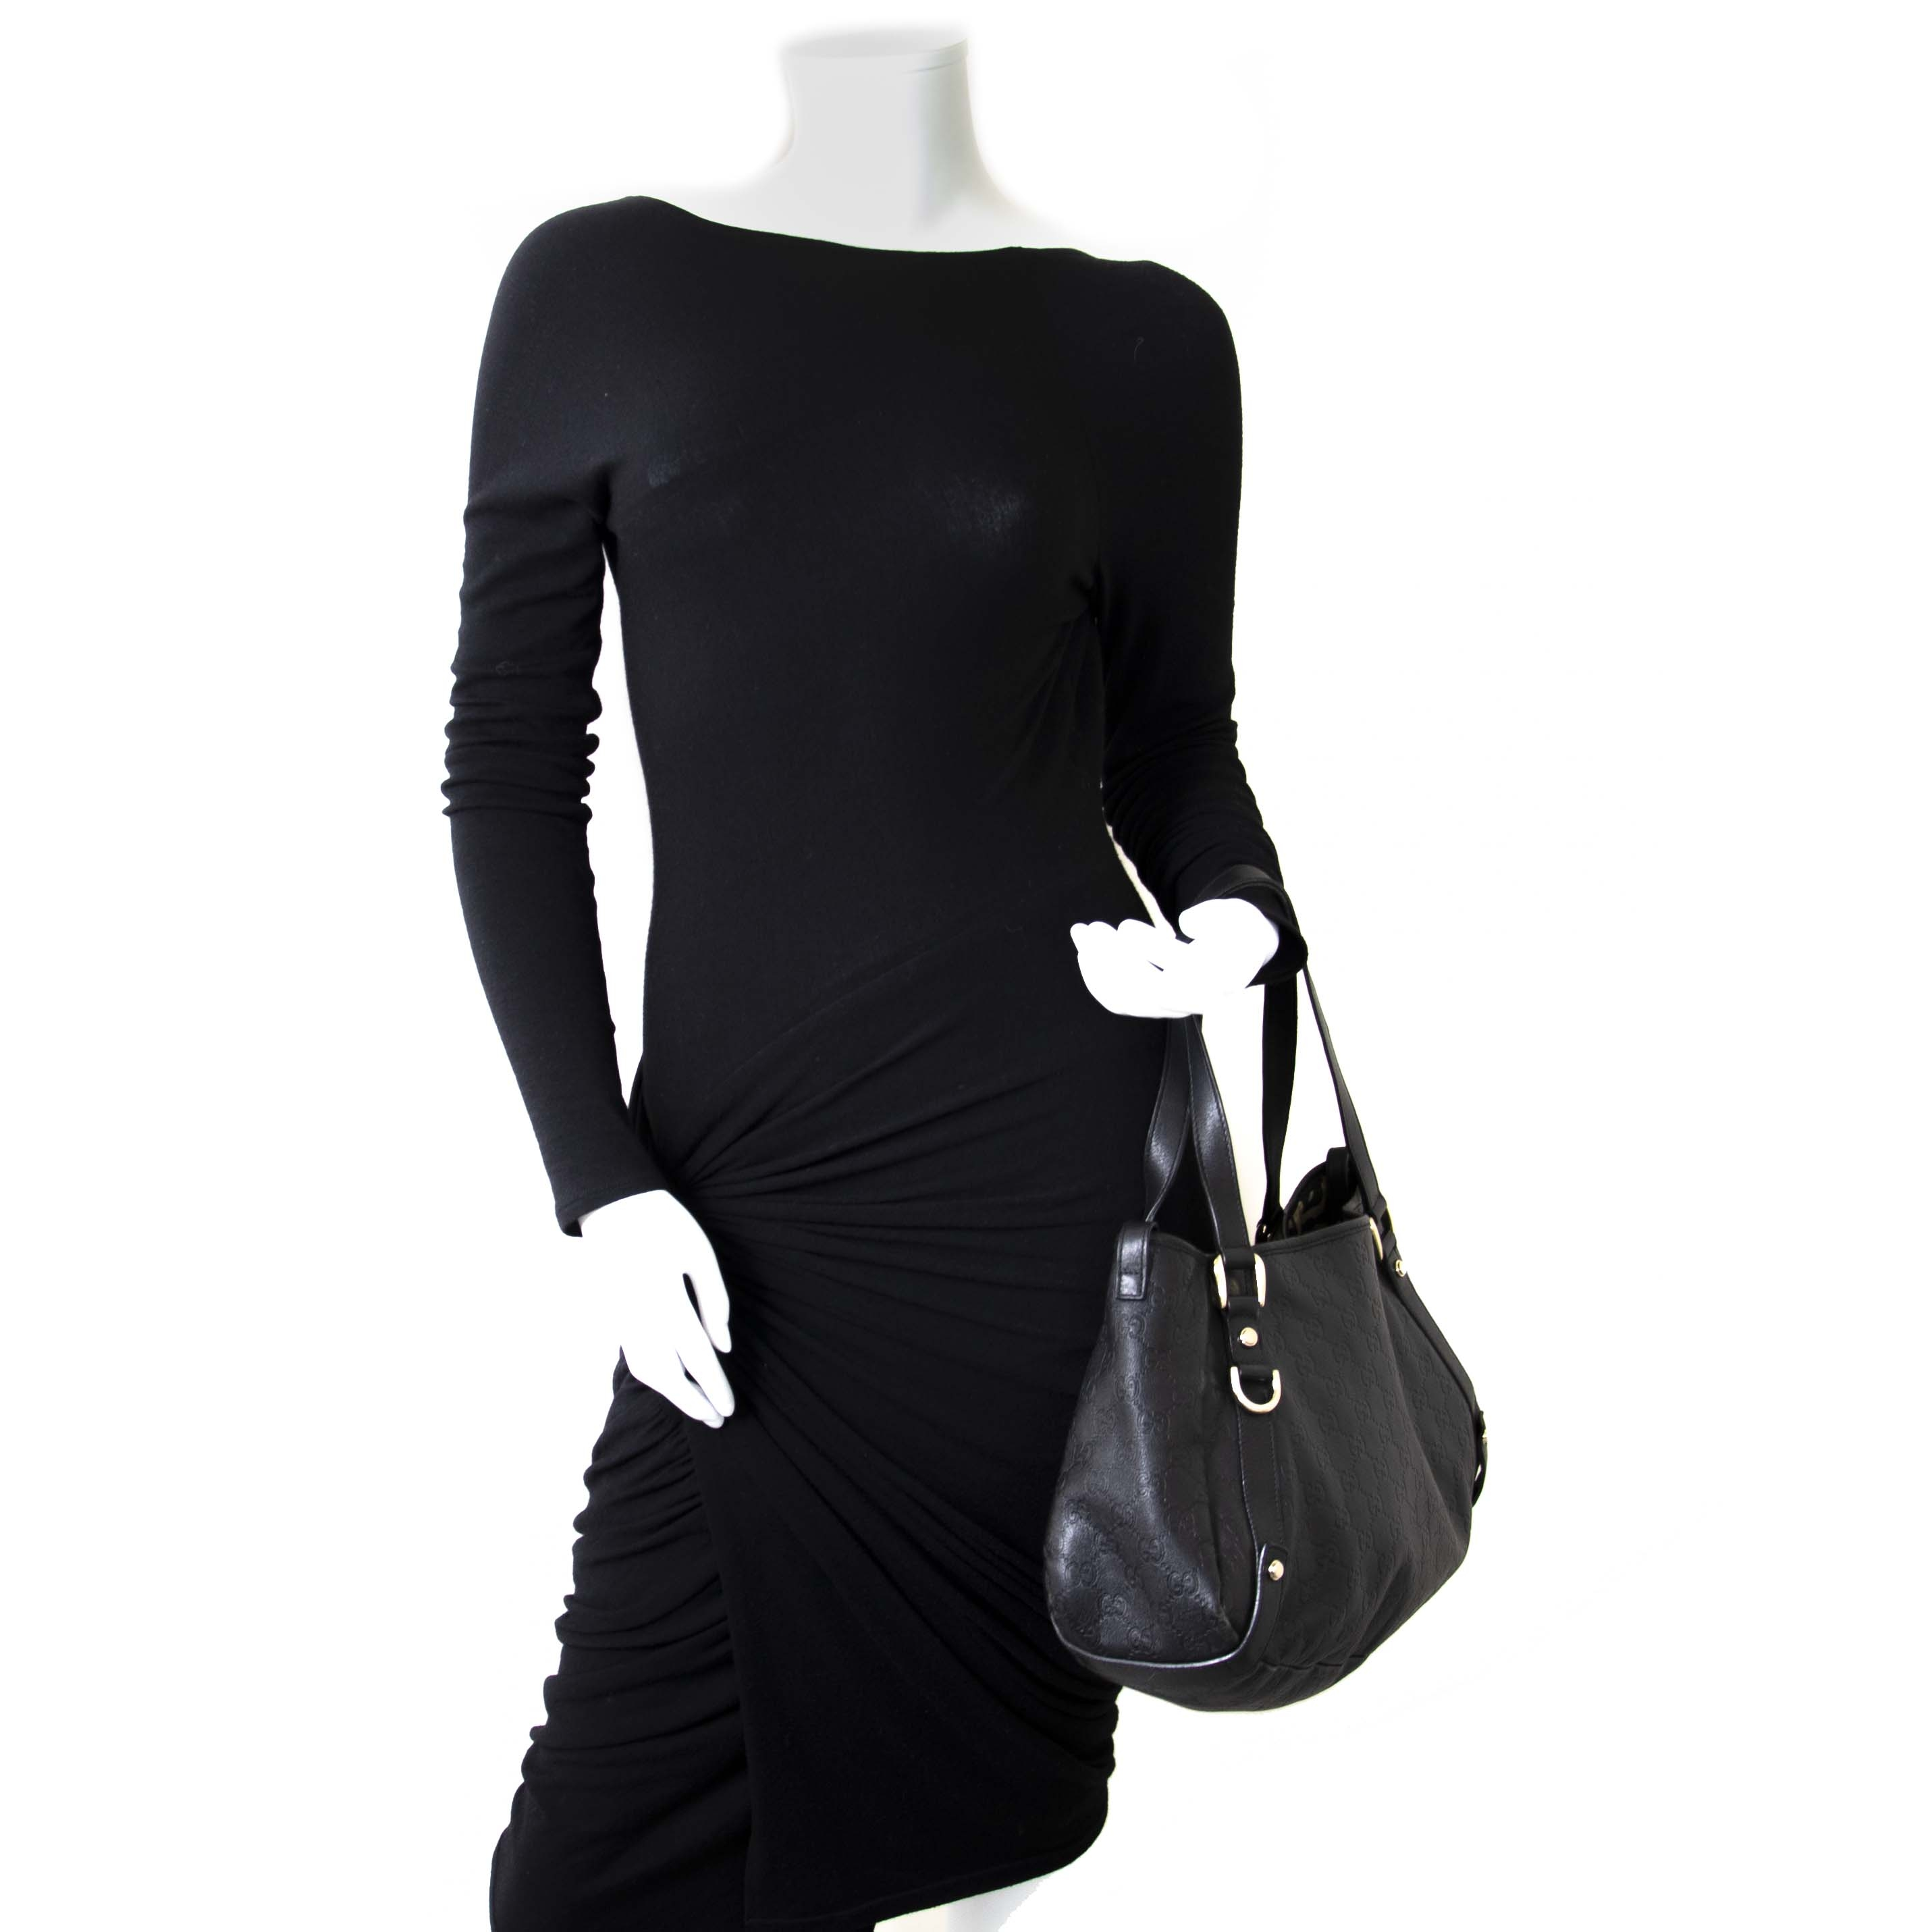 ... Gucci Guccissima Leather Medium Abbey Tote Bag now for sale at labellov  vintage fashion webshop belgium 8b53e9347ab16